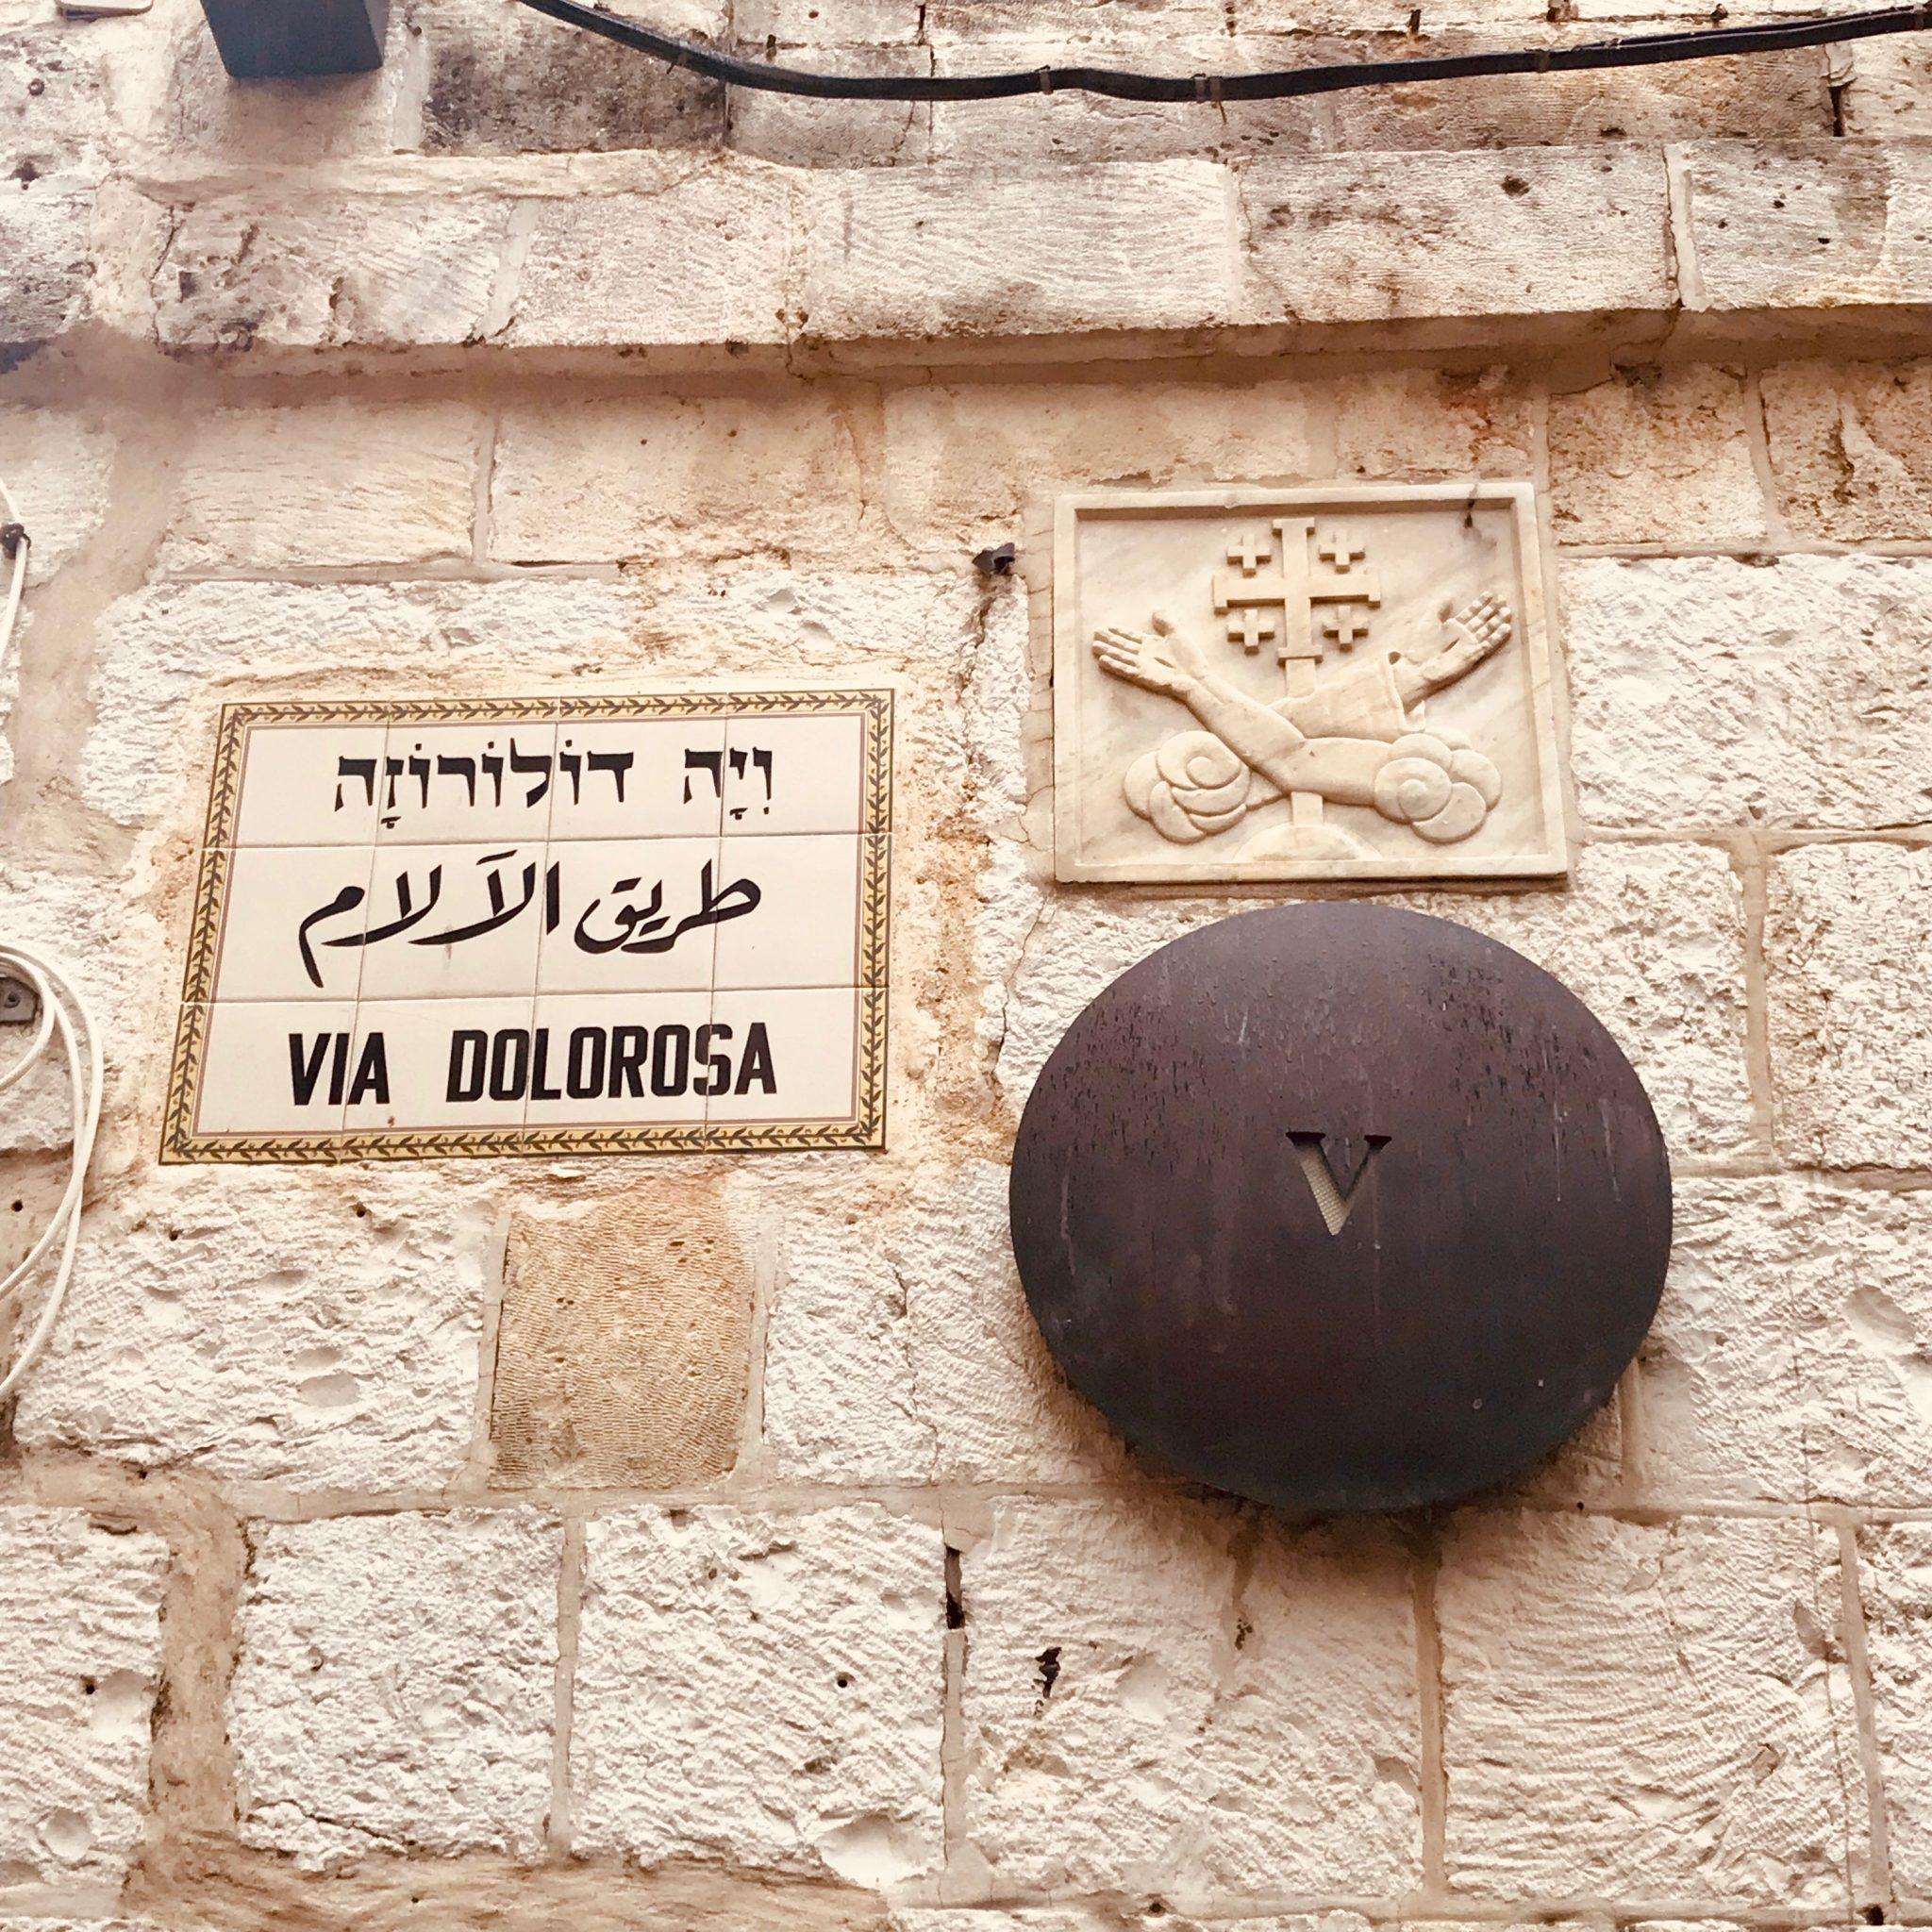 stations of the cross in jerusalem in bethlehem